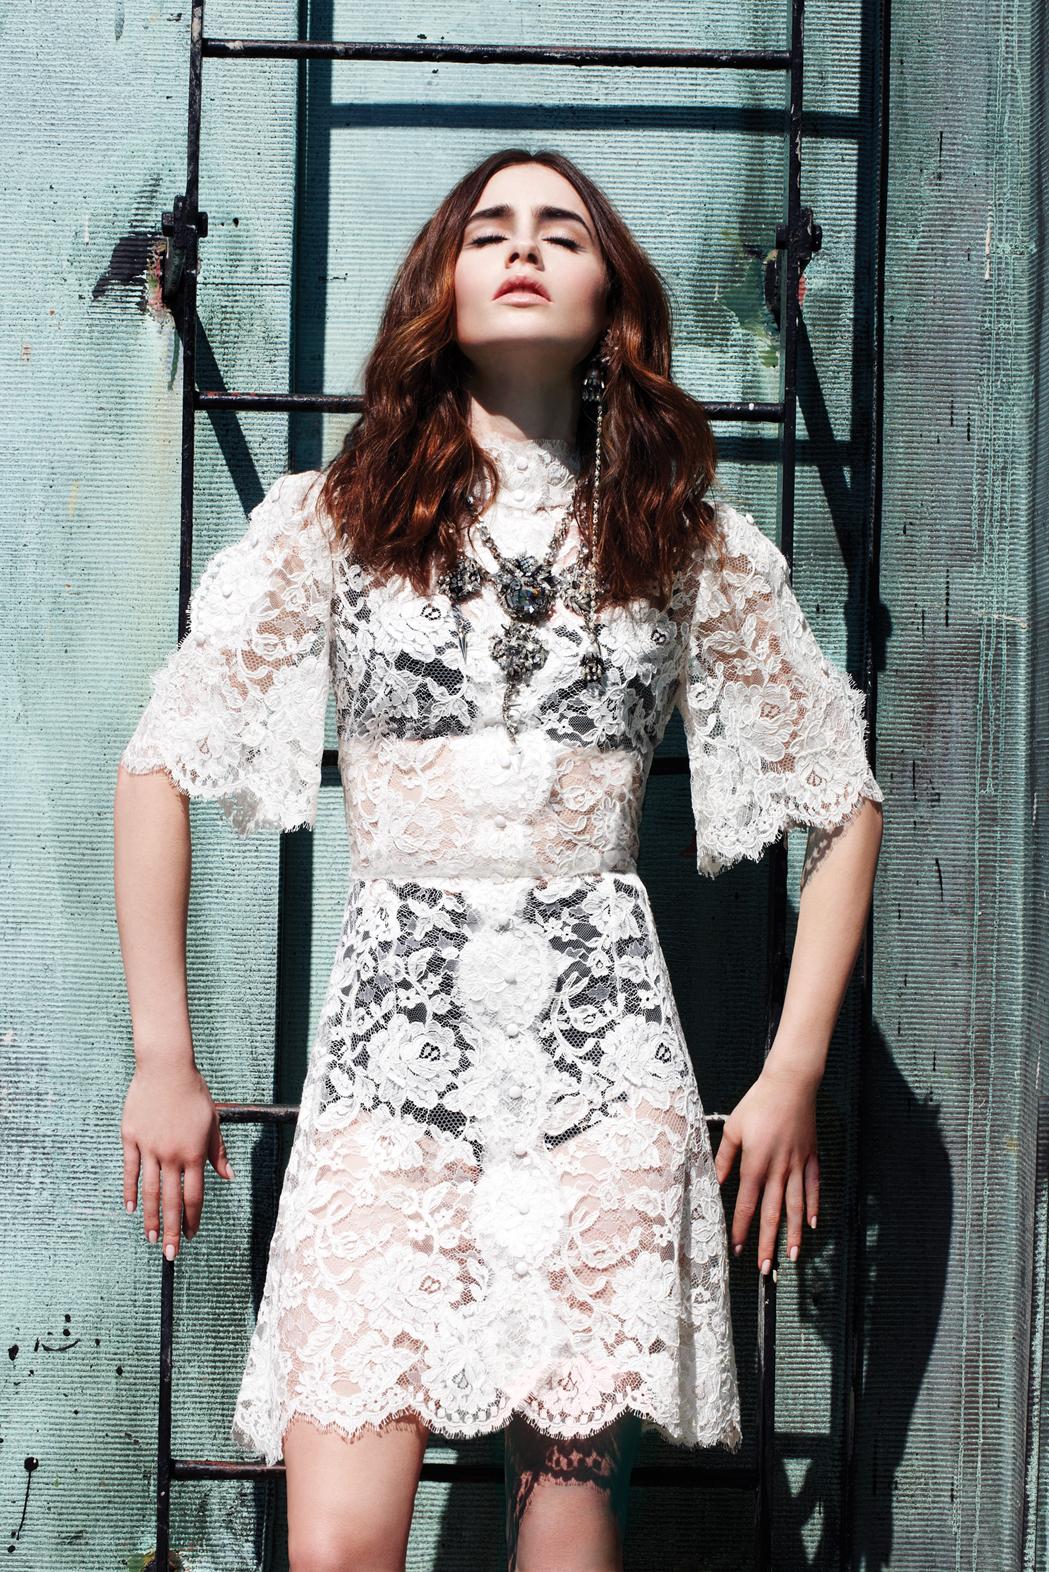 Lily Collins 2013 : Lily Collins: Elle Magazine 2013 -04